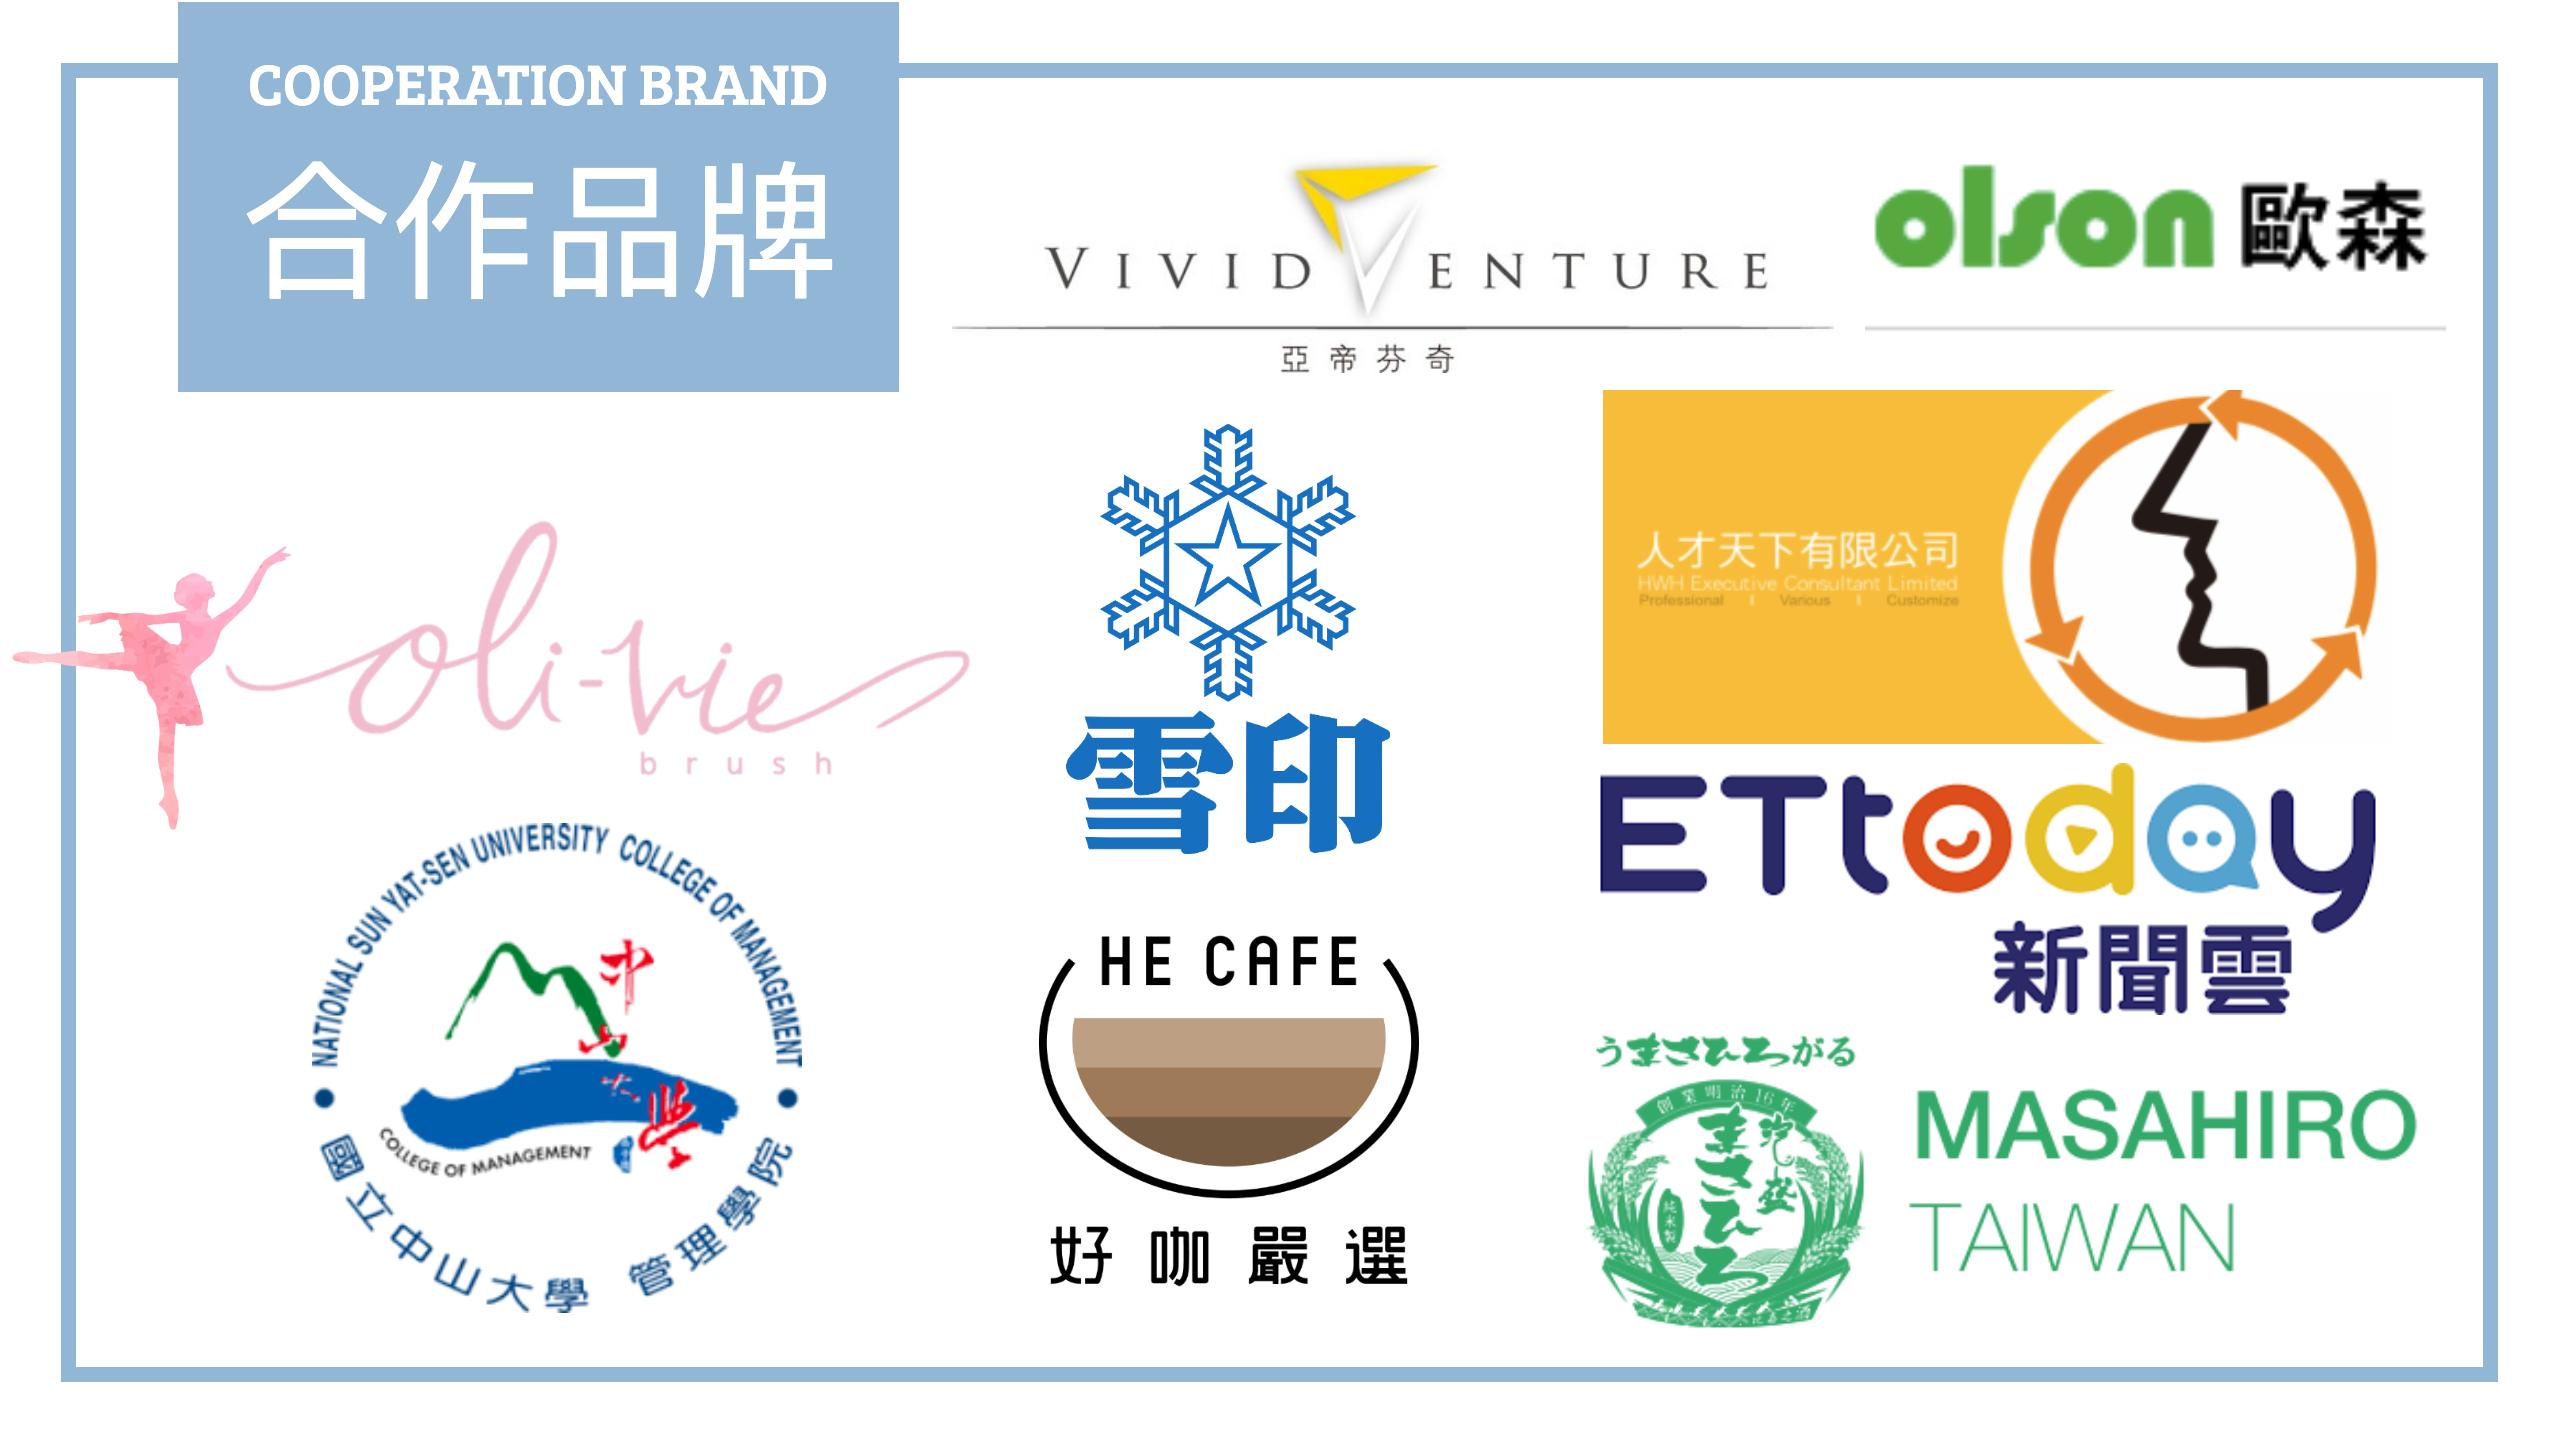 Oli Vie Design,歐妞設計,歐妞義式刷具,中山大學,EMBA,雪印,好咖嚴選,歐森系統櫥具,ETtoday,東森新聞雲,Masahiro,人才天下,人才天下有限公司